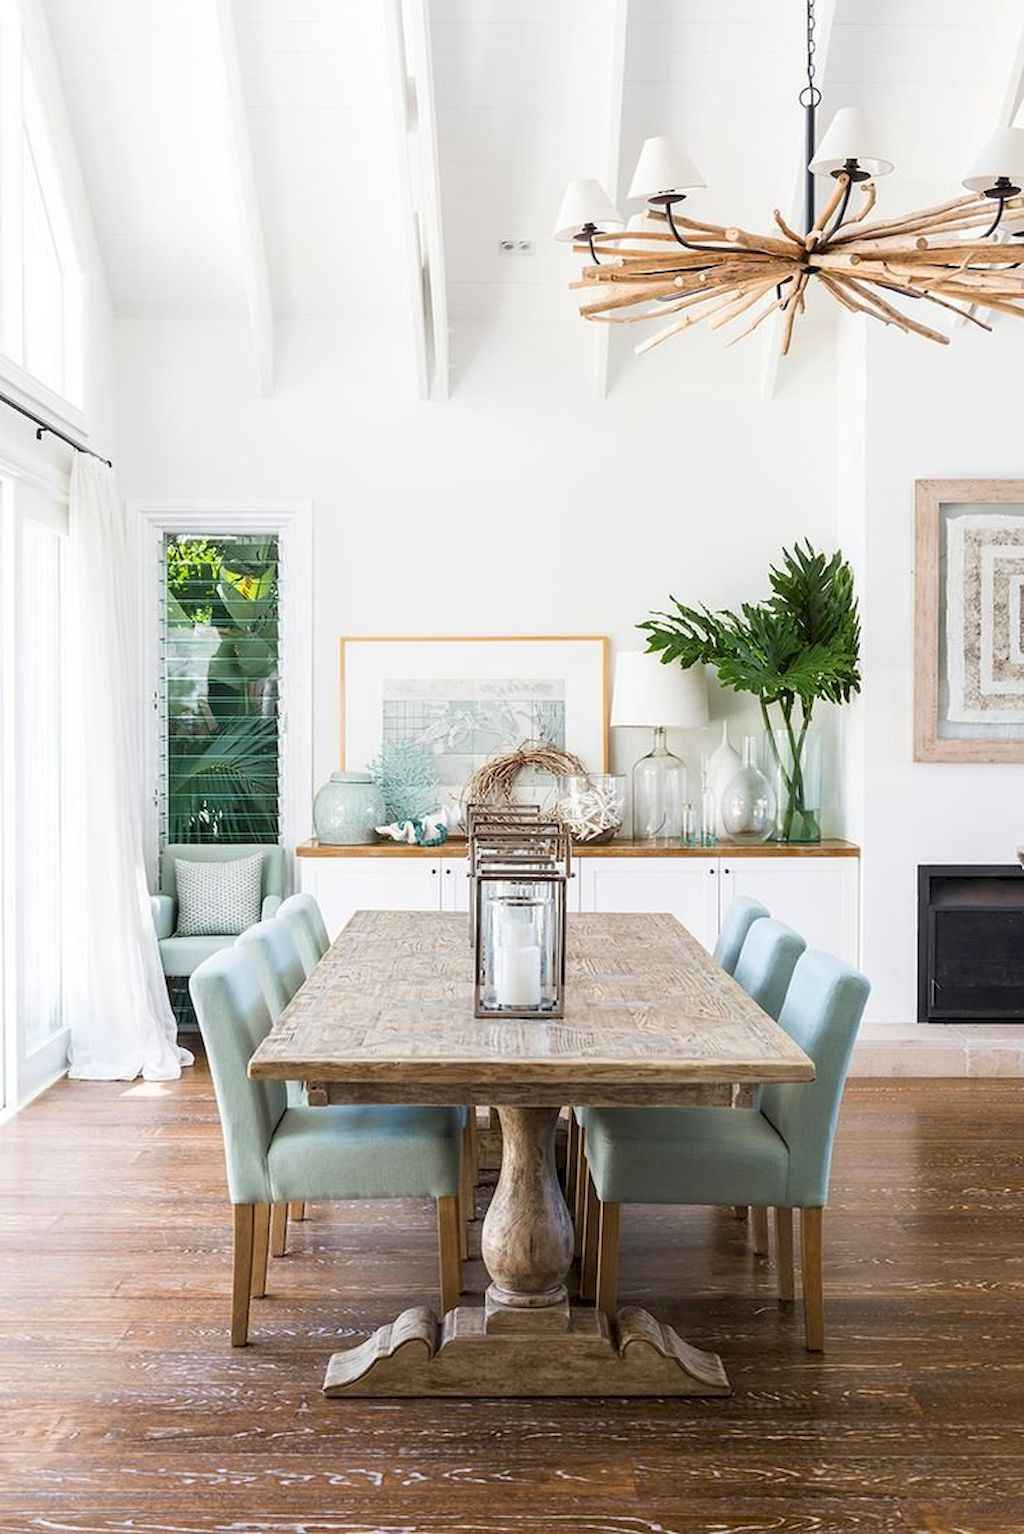 100 Rustic Farmhouse Dining Room Decor Ideas (21)